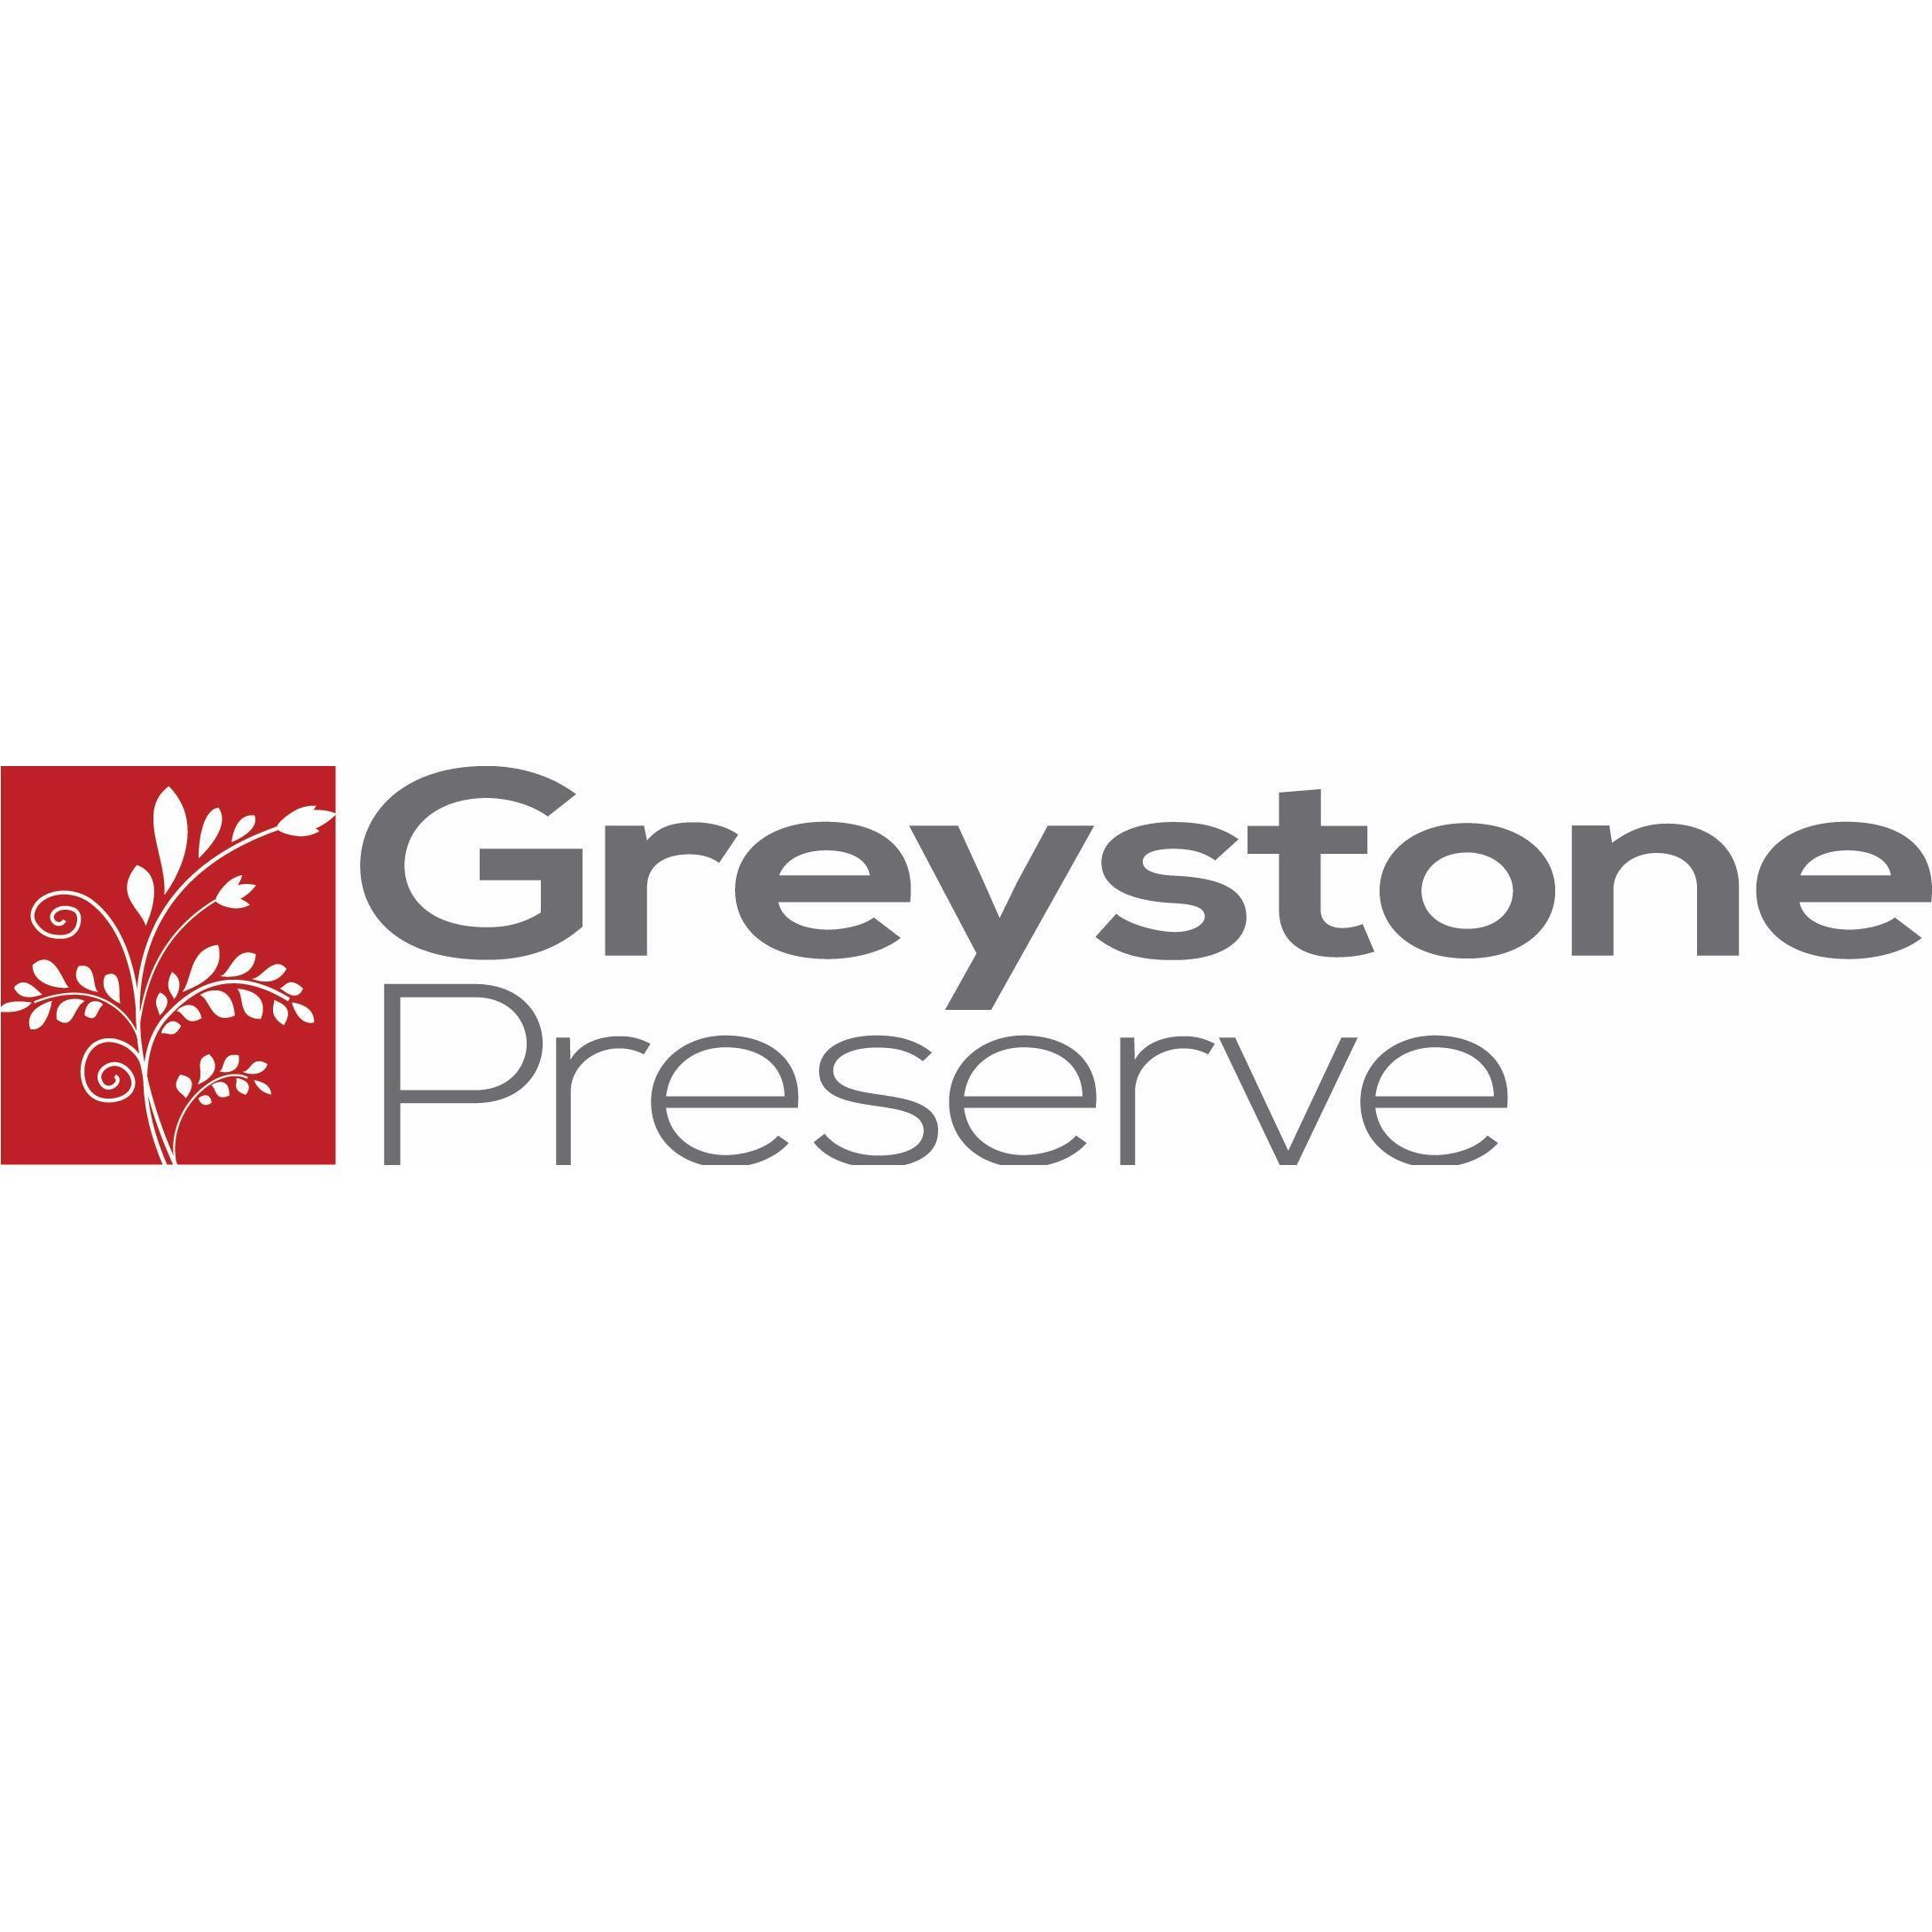 Greystone Preserve